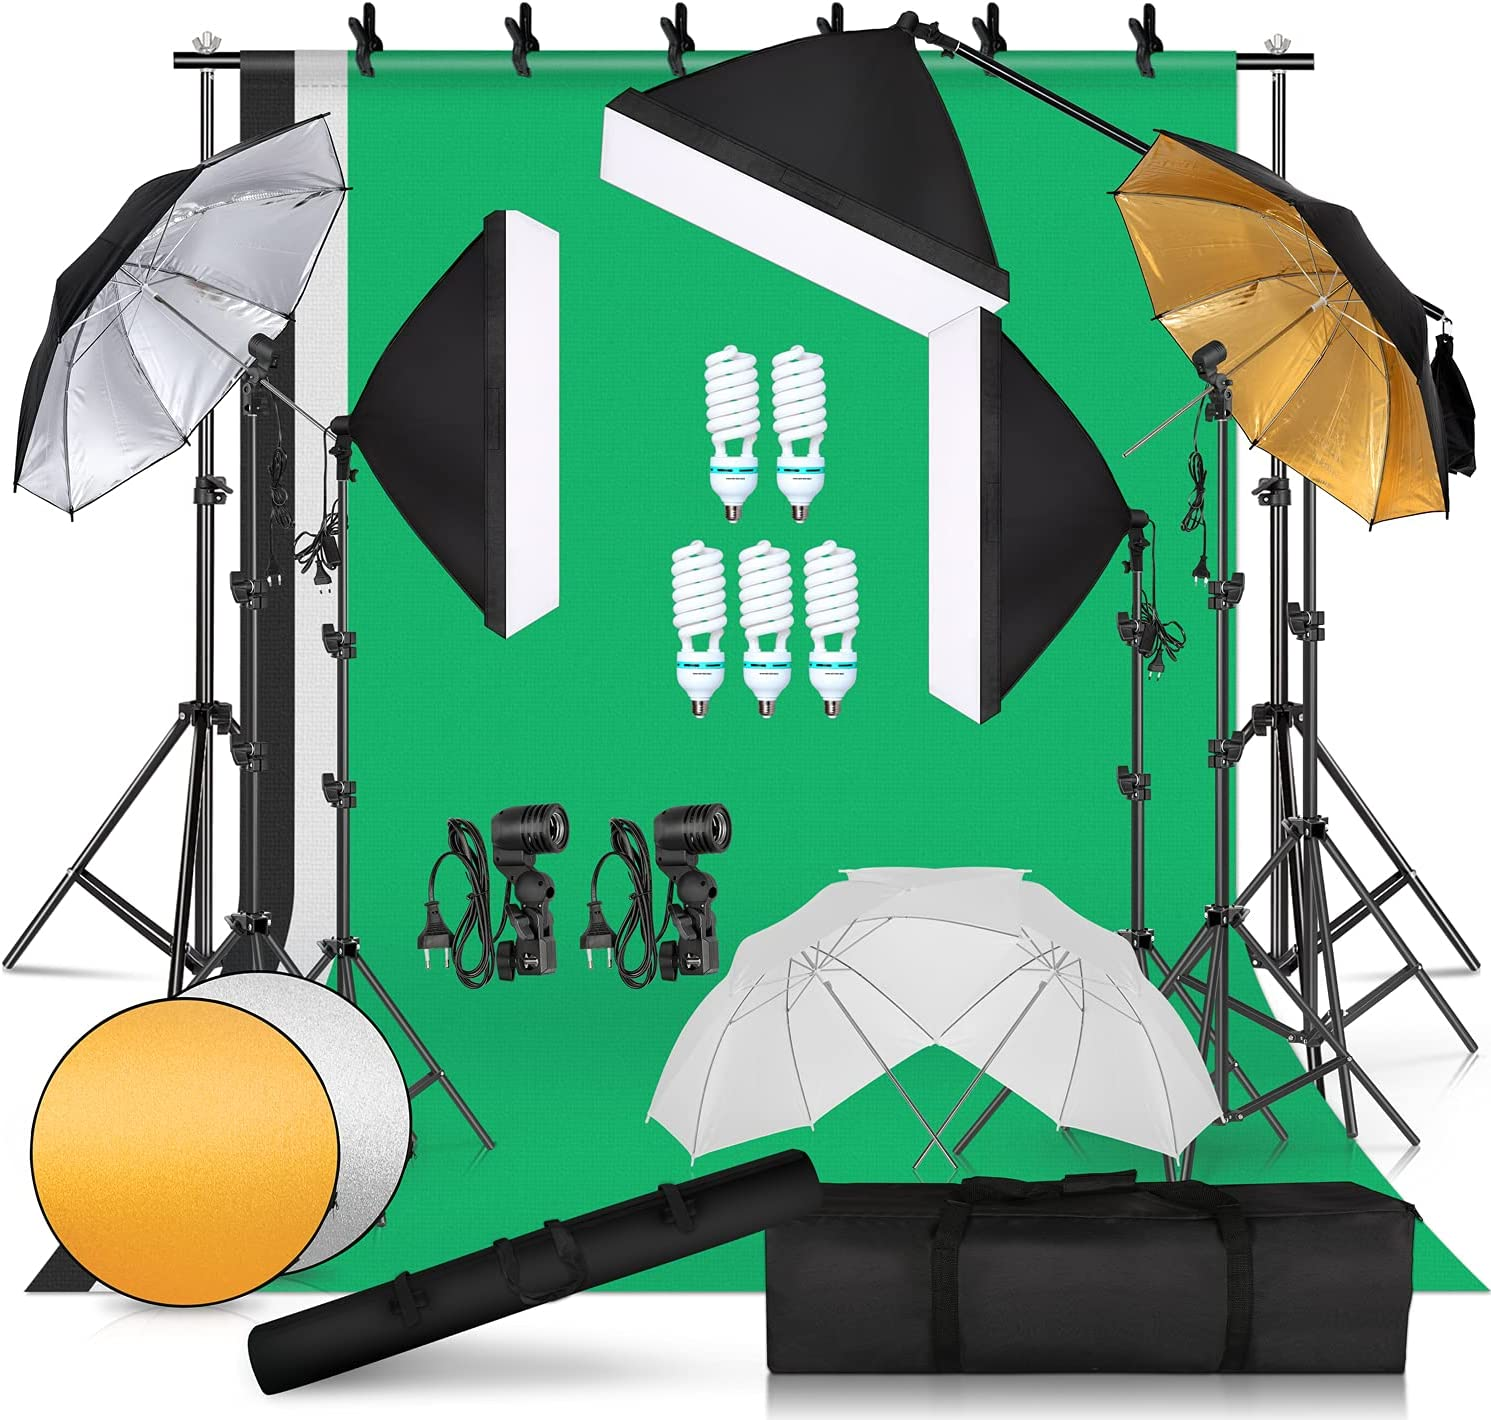 Photographic Umbrella Milwaukee Mall Soft Box Omaha Mall Background Kit Lighting 8.5x10ft